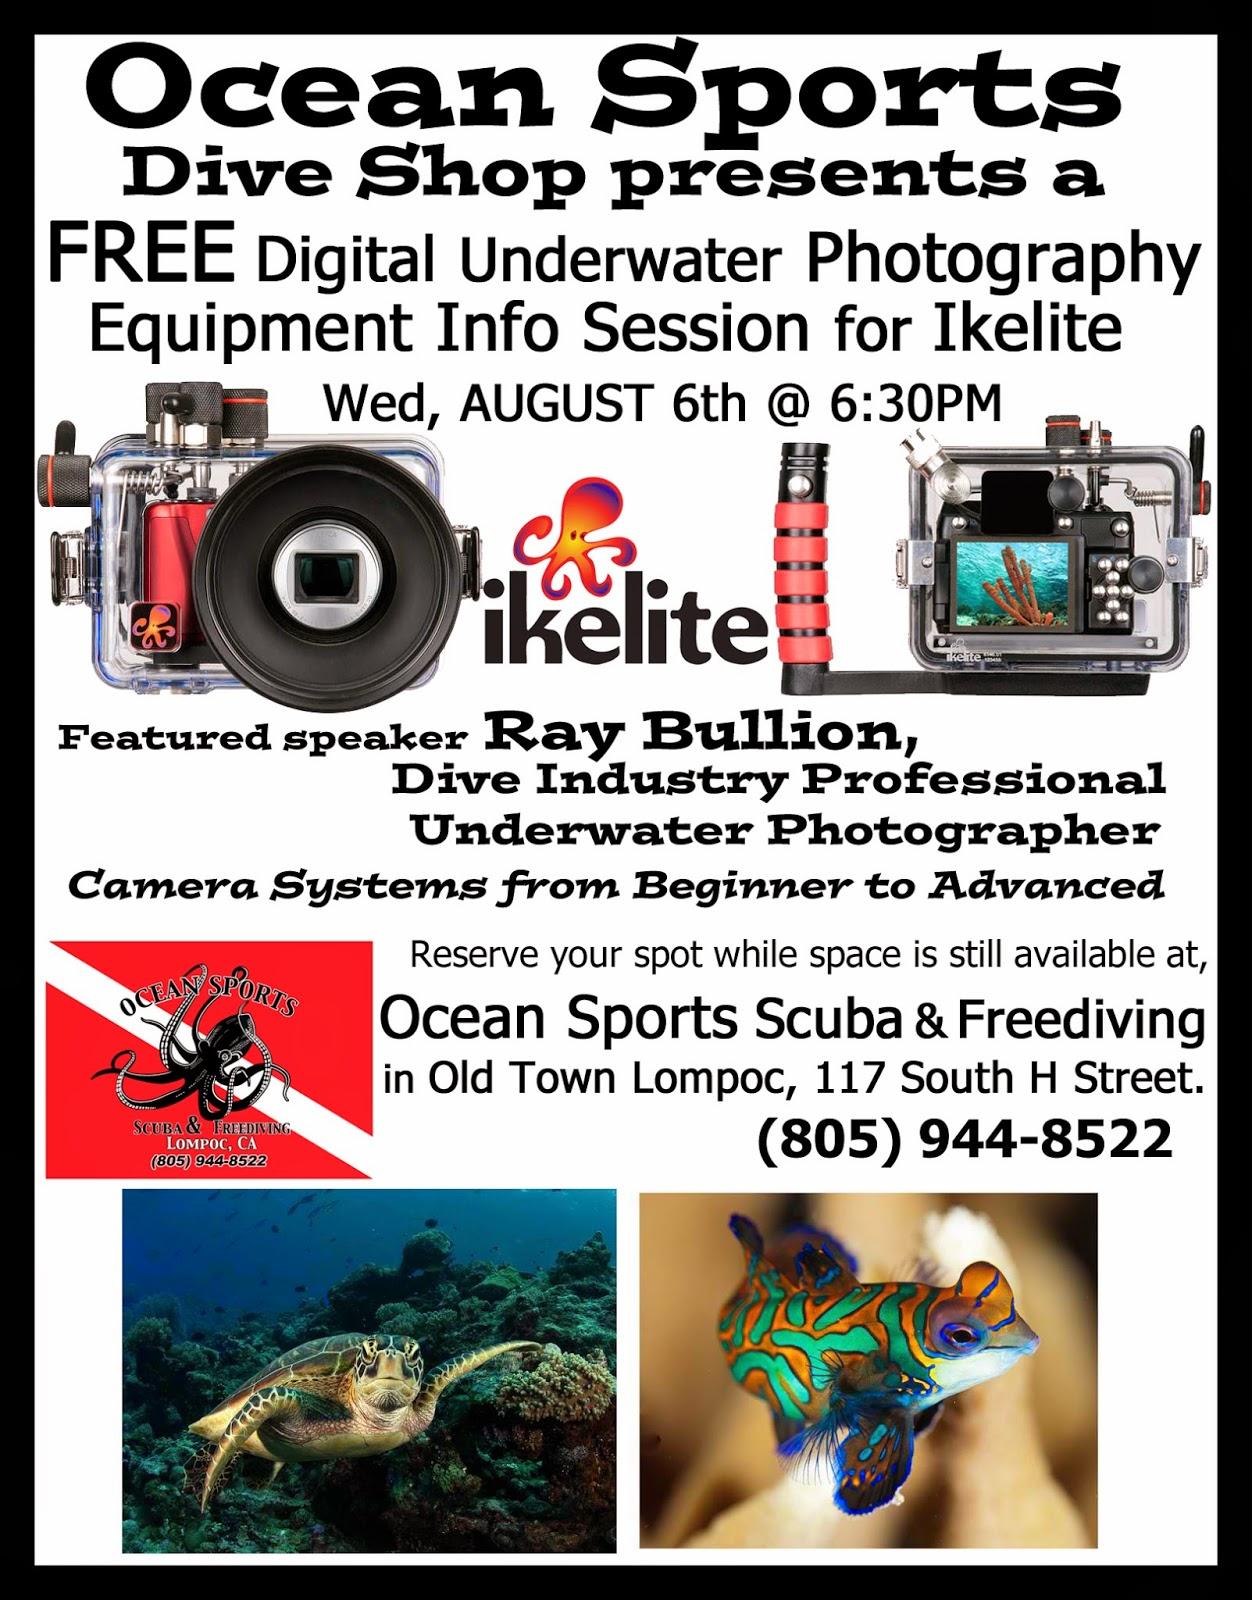 Ocean sports scuba freediving in lompoc ca full service - Dive system shop ...